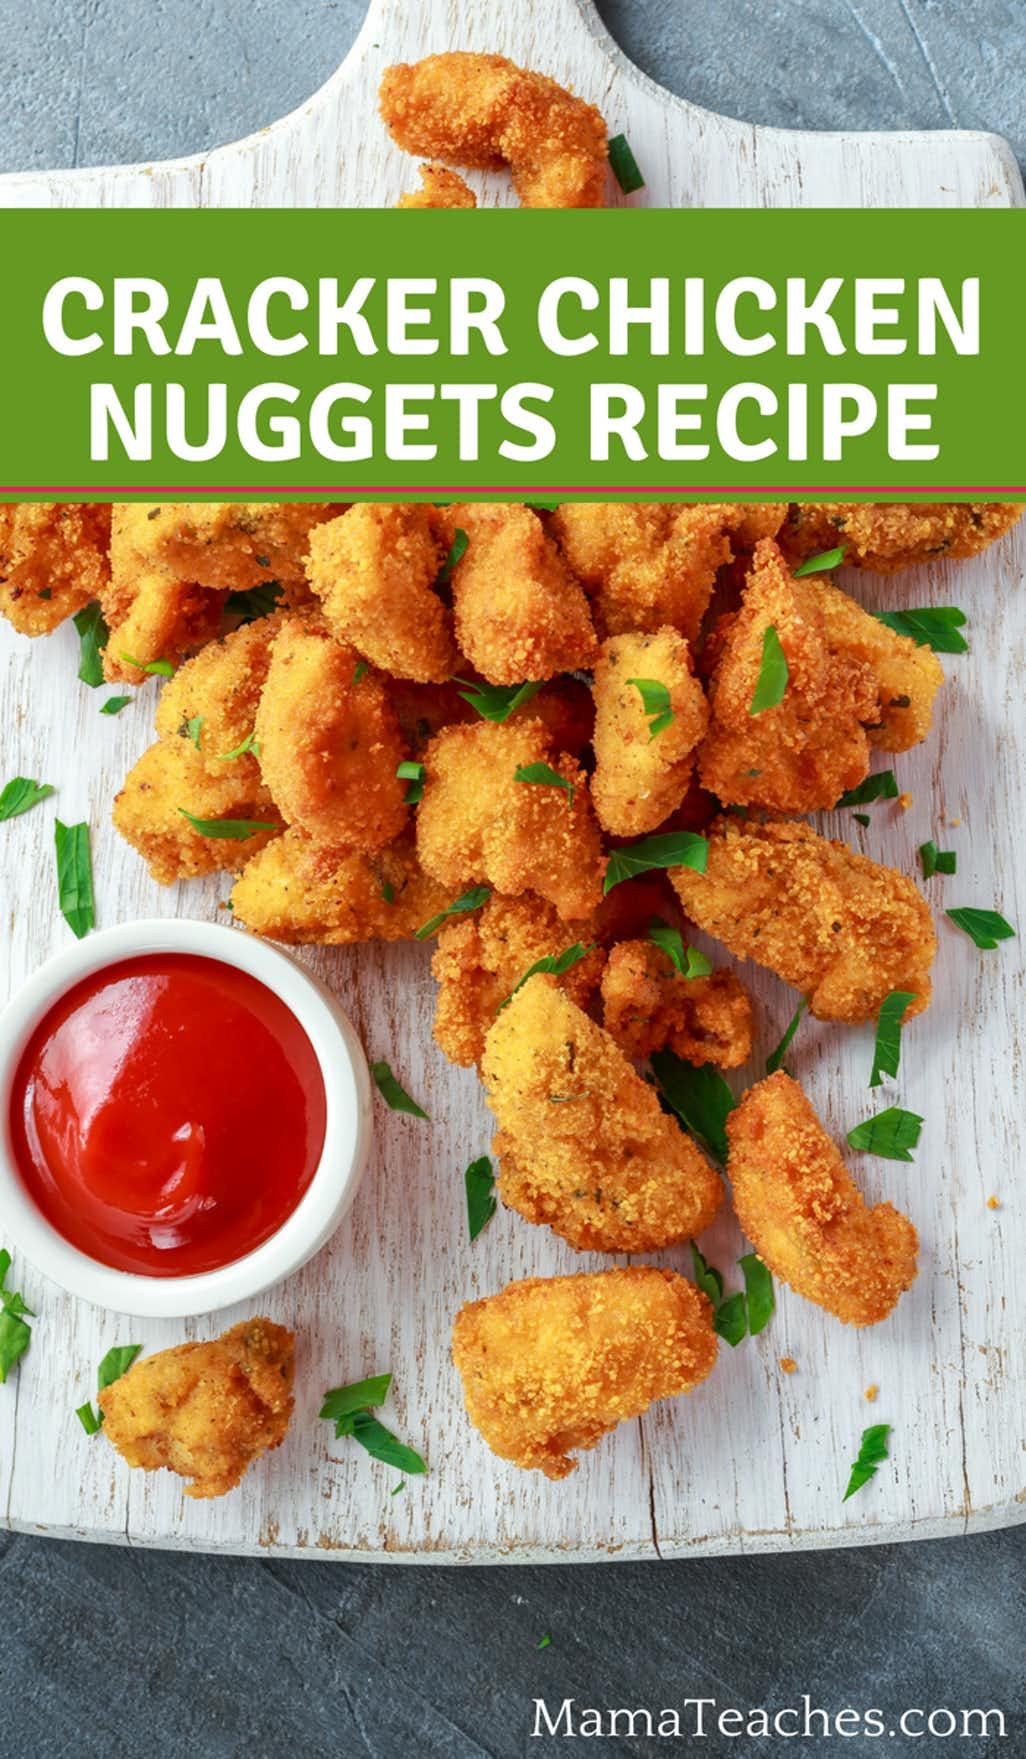 Cracker Chicken Nuggets Recipe